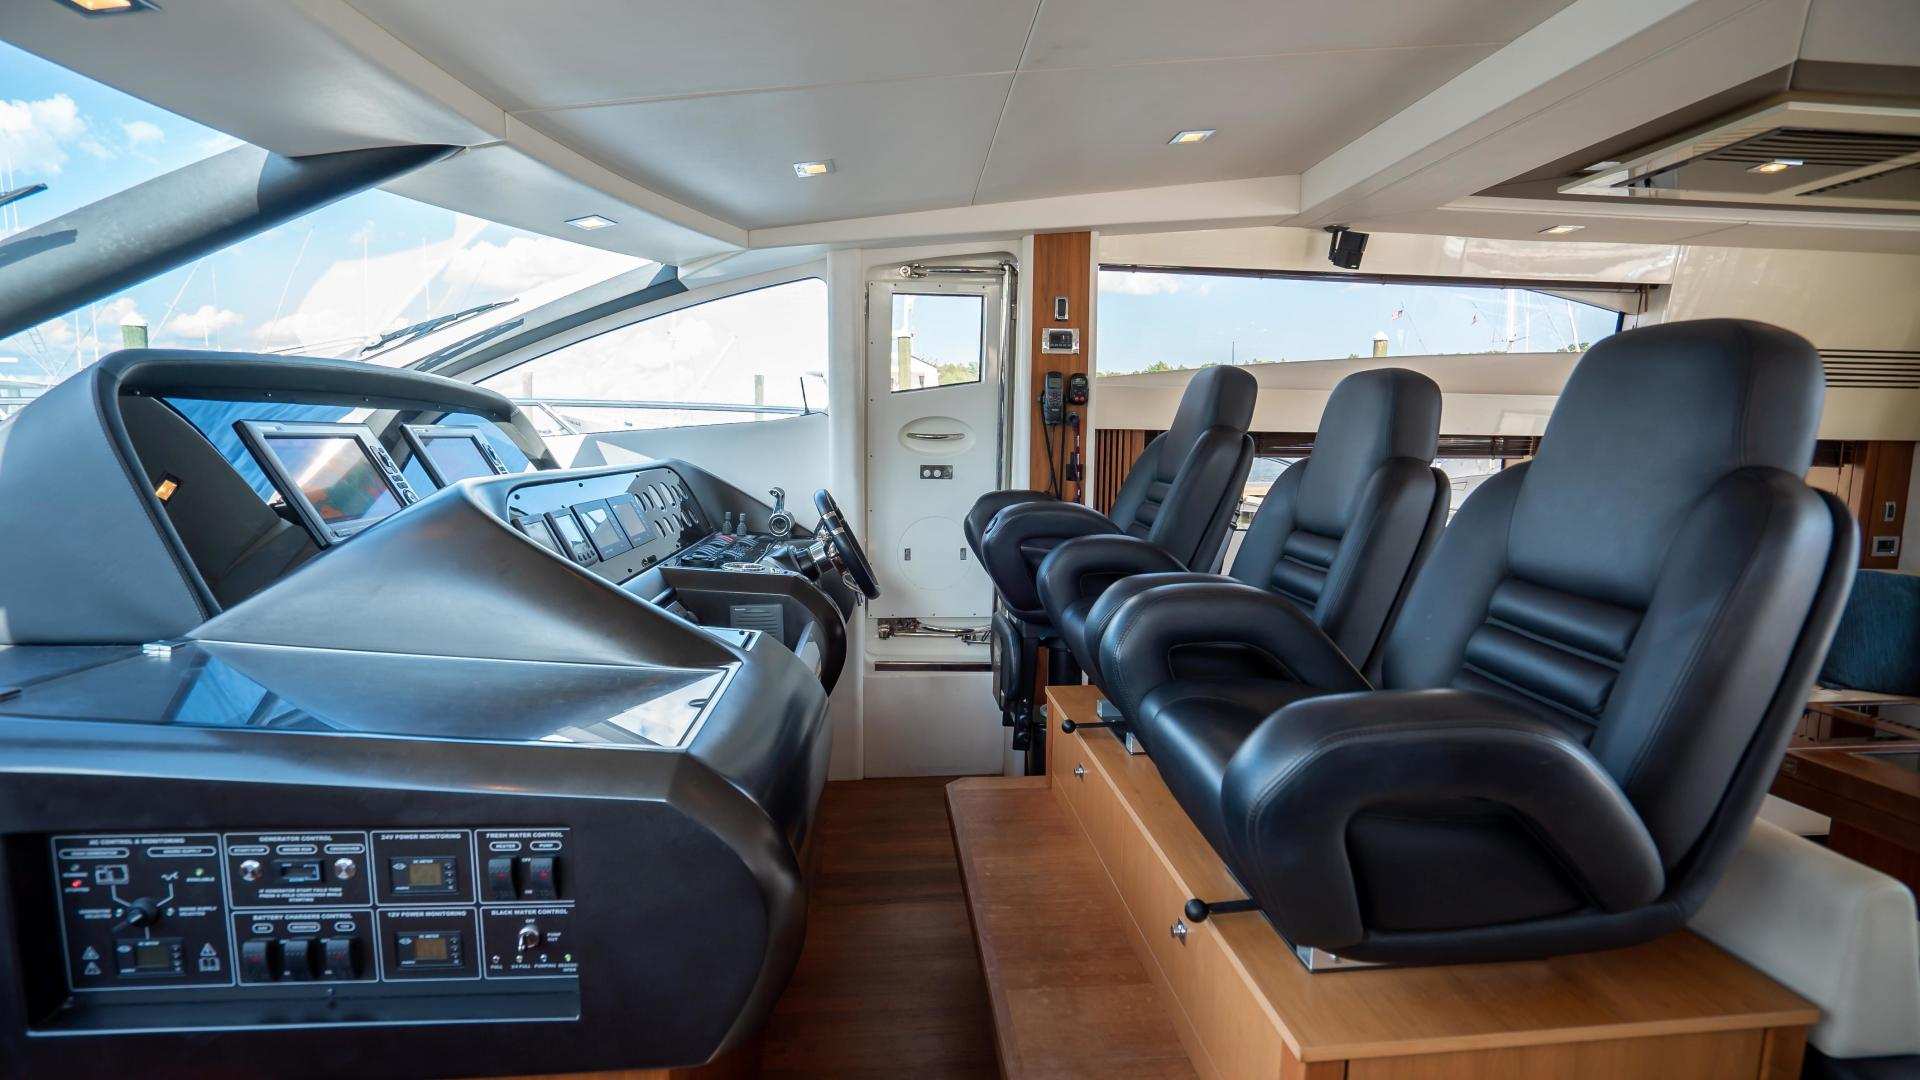 Sunseeker-Motor yacht 2012-JIMBO New Port-Rhode Island-United States-1480230 | Thumbnail